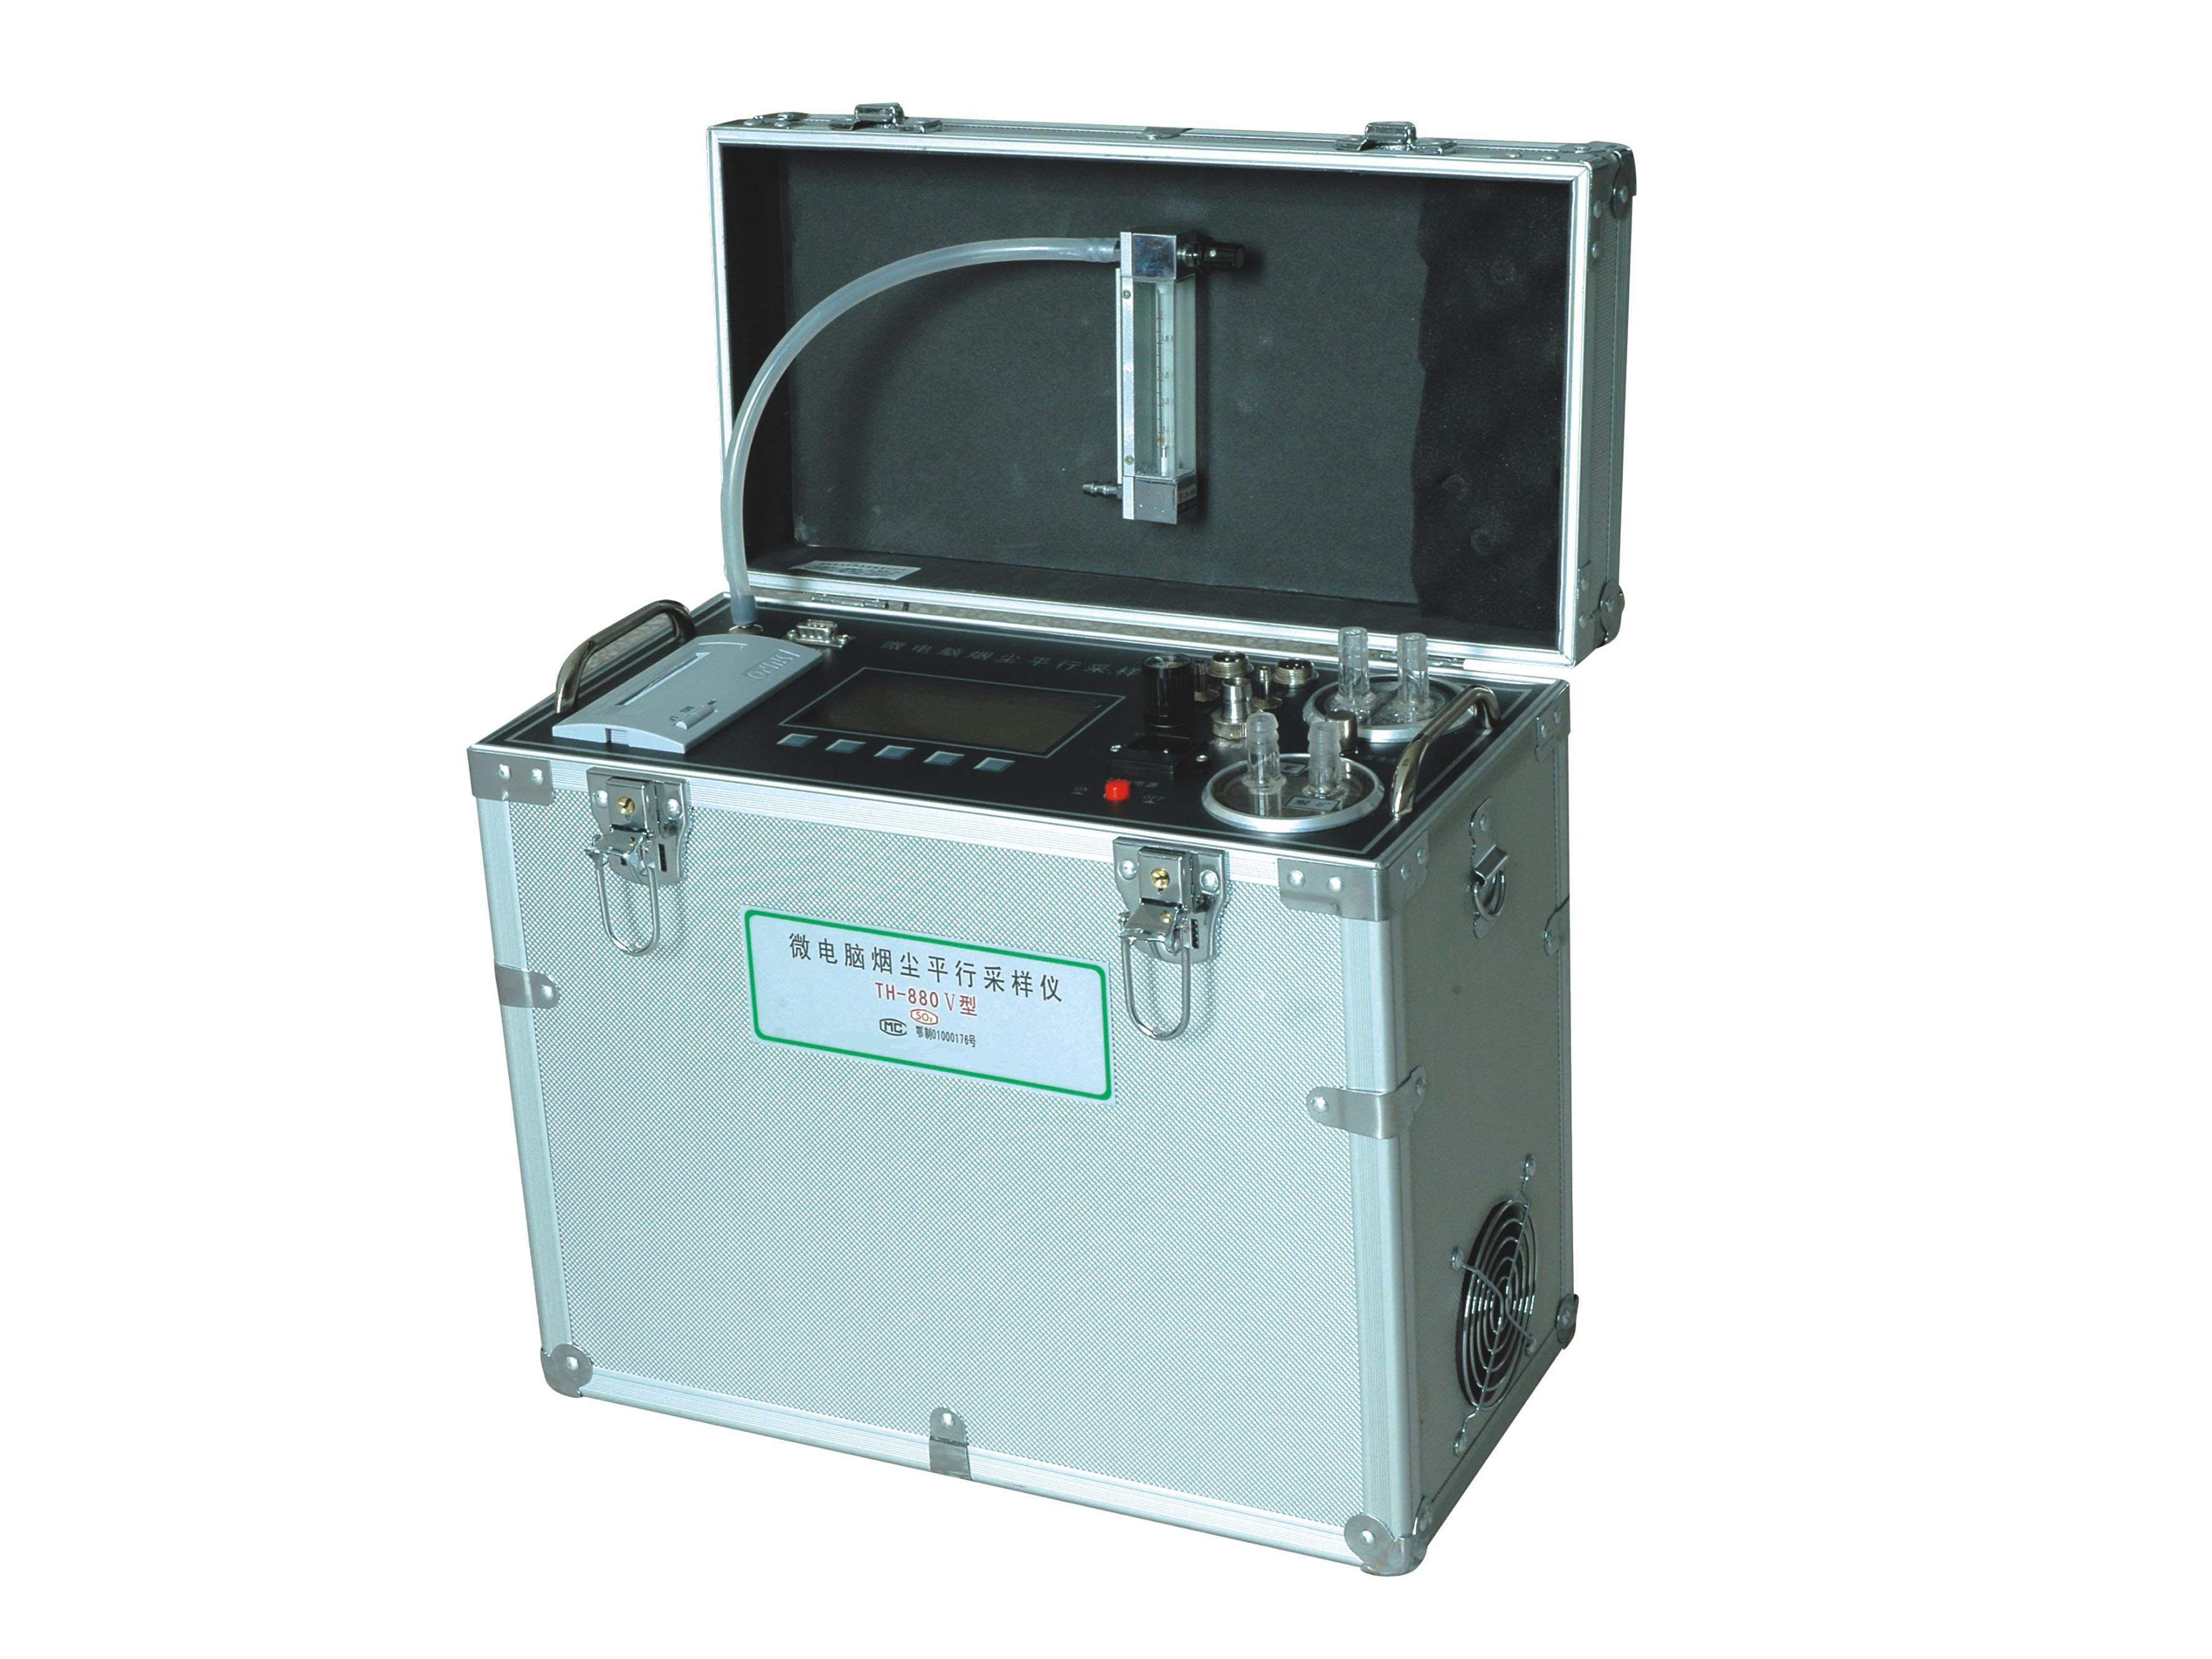 ZH-TH-880VI烟尘(油烟)采样仪器是我厂针对国内环监部门现状和国际发展的趋势,在国内同行中率先采用微电脑和高精度微差压传感器、干湿球温度传感器、温度热电偶等传感器的智能化烟尘(油烟)平行采样仪,保证了在各种复杂烟道内烟气流量动态变化较大的情况下使采样流量能保持等速,并能自动跟踪流量变化,从而减少人工调节误差和监测人员的劳动强度。广泛应用于工业炉窑锅炉等烟尘及饮食行业油烟排放浓度、排放量、除尘效率(及含氧量)多项参数的测定。本仪器采用皮托管平行采样法的原理,操作简便快捷,测量数据准确可靠,测量结果可